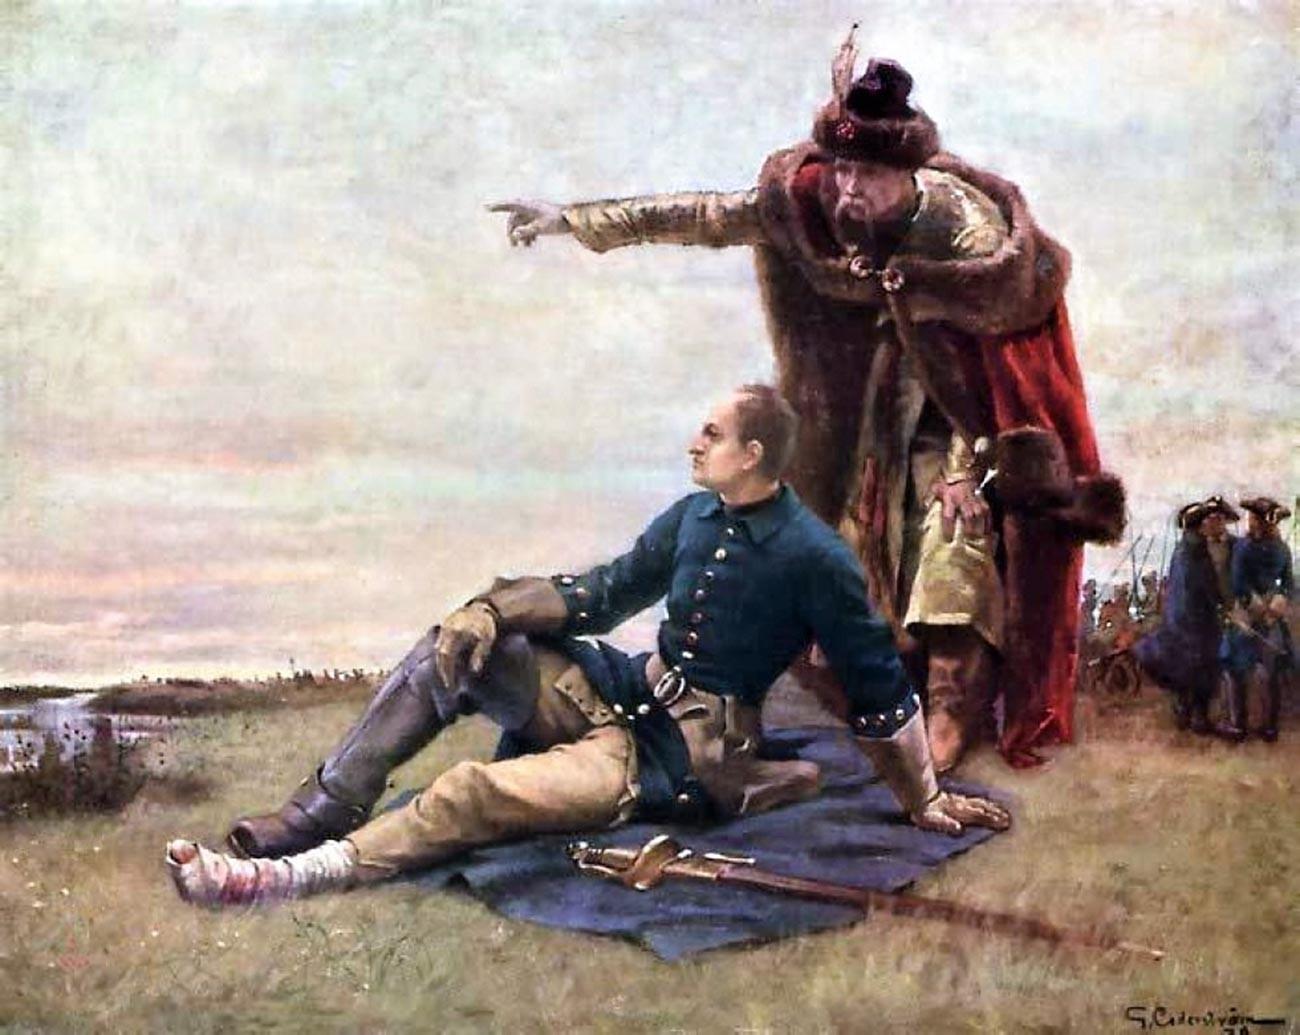 Karlo XII. i Mazepa nakon Poltavske bitke